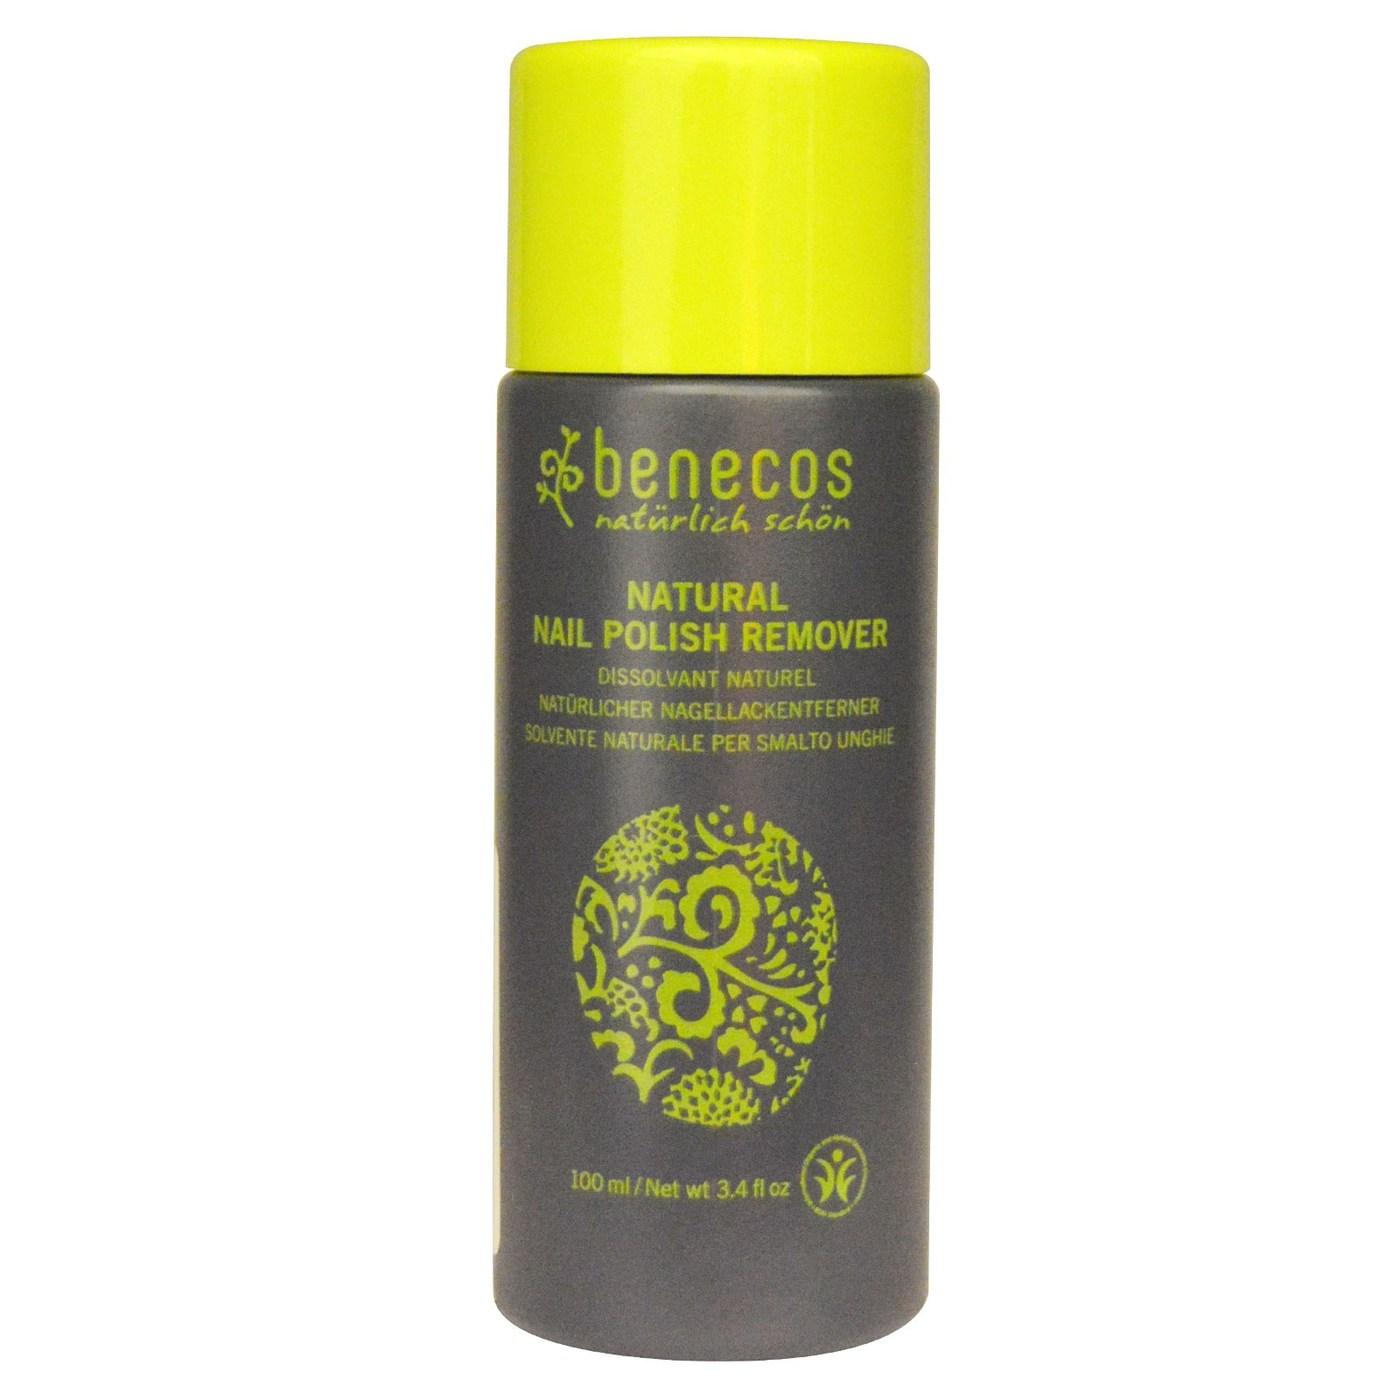 Buy Benecos Natural Nail Polish Remover - 3.4 fl oz - eVitamins ...